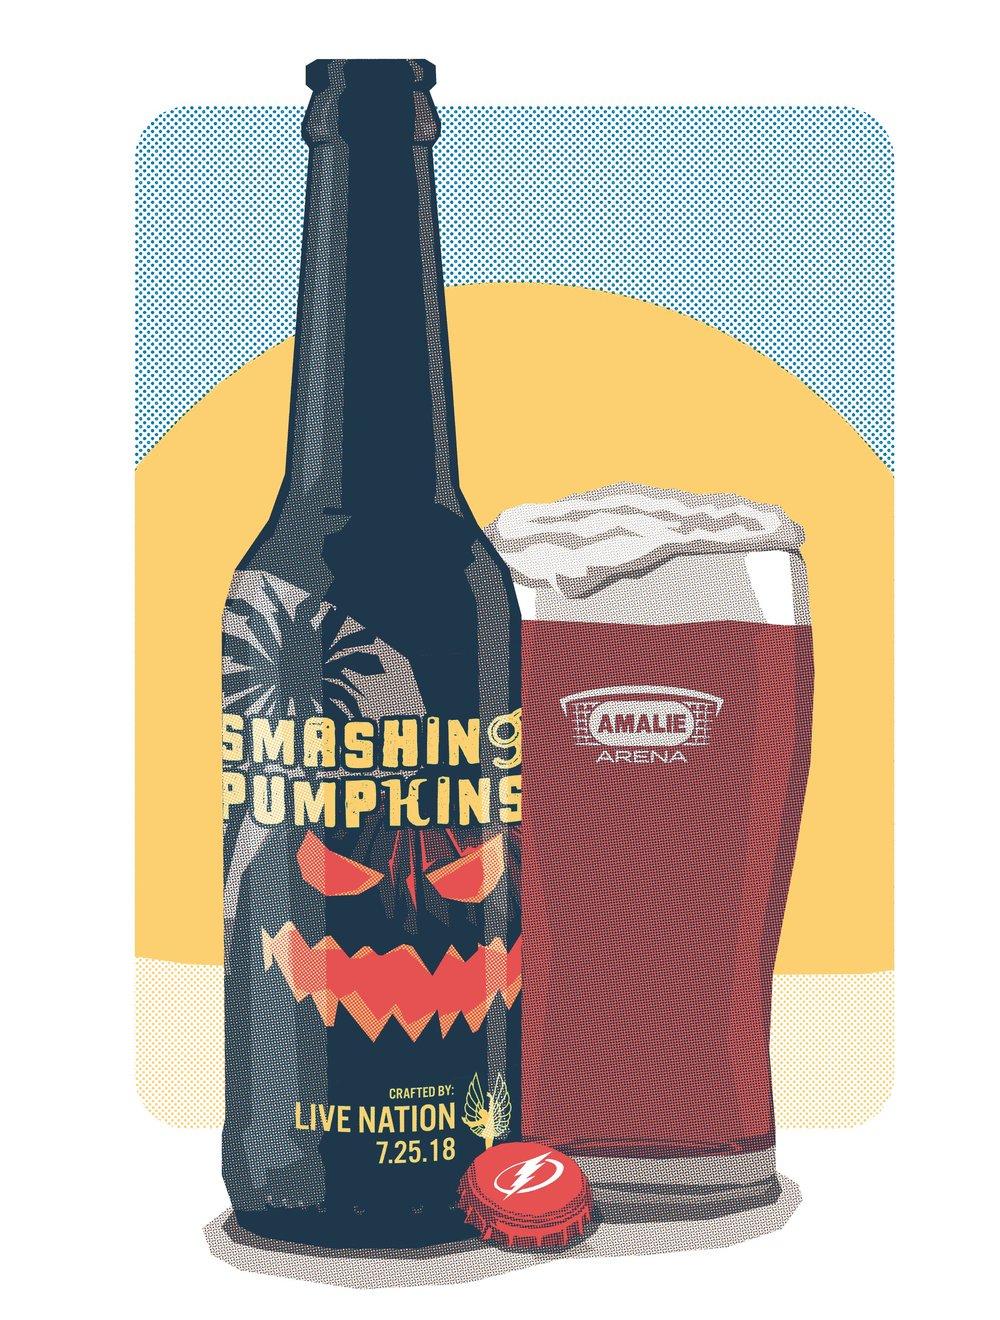 Smashing Pumpkins - 3 Color Screen Print